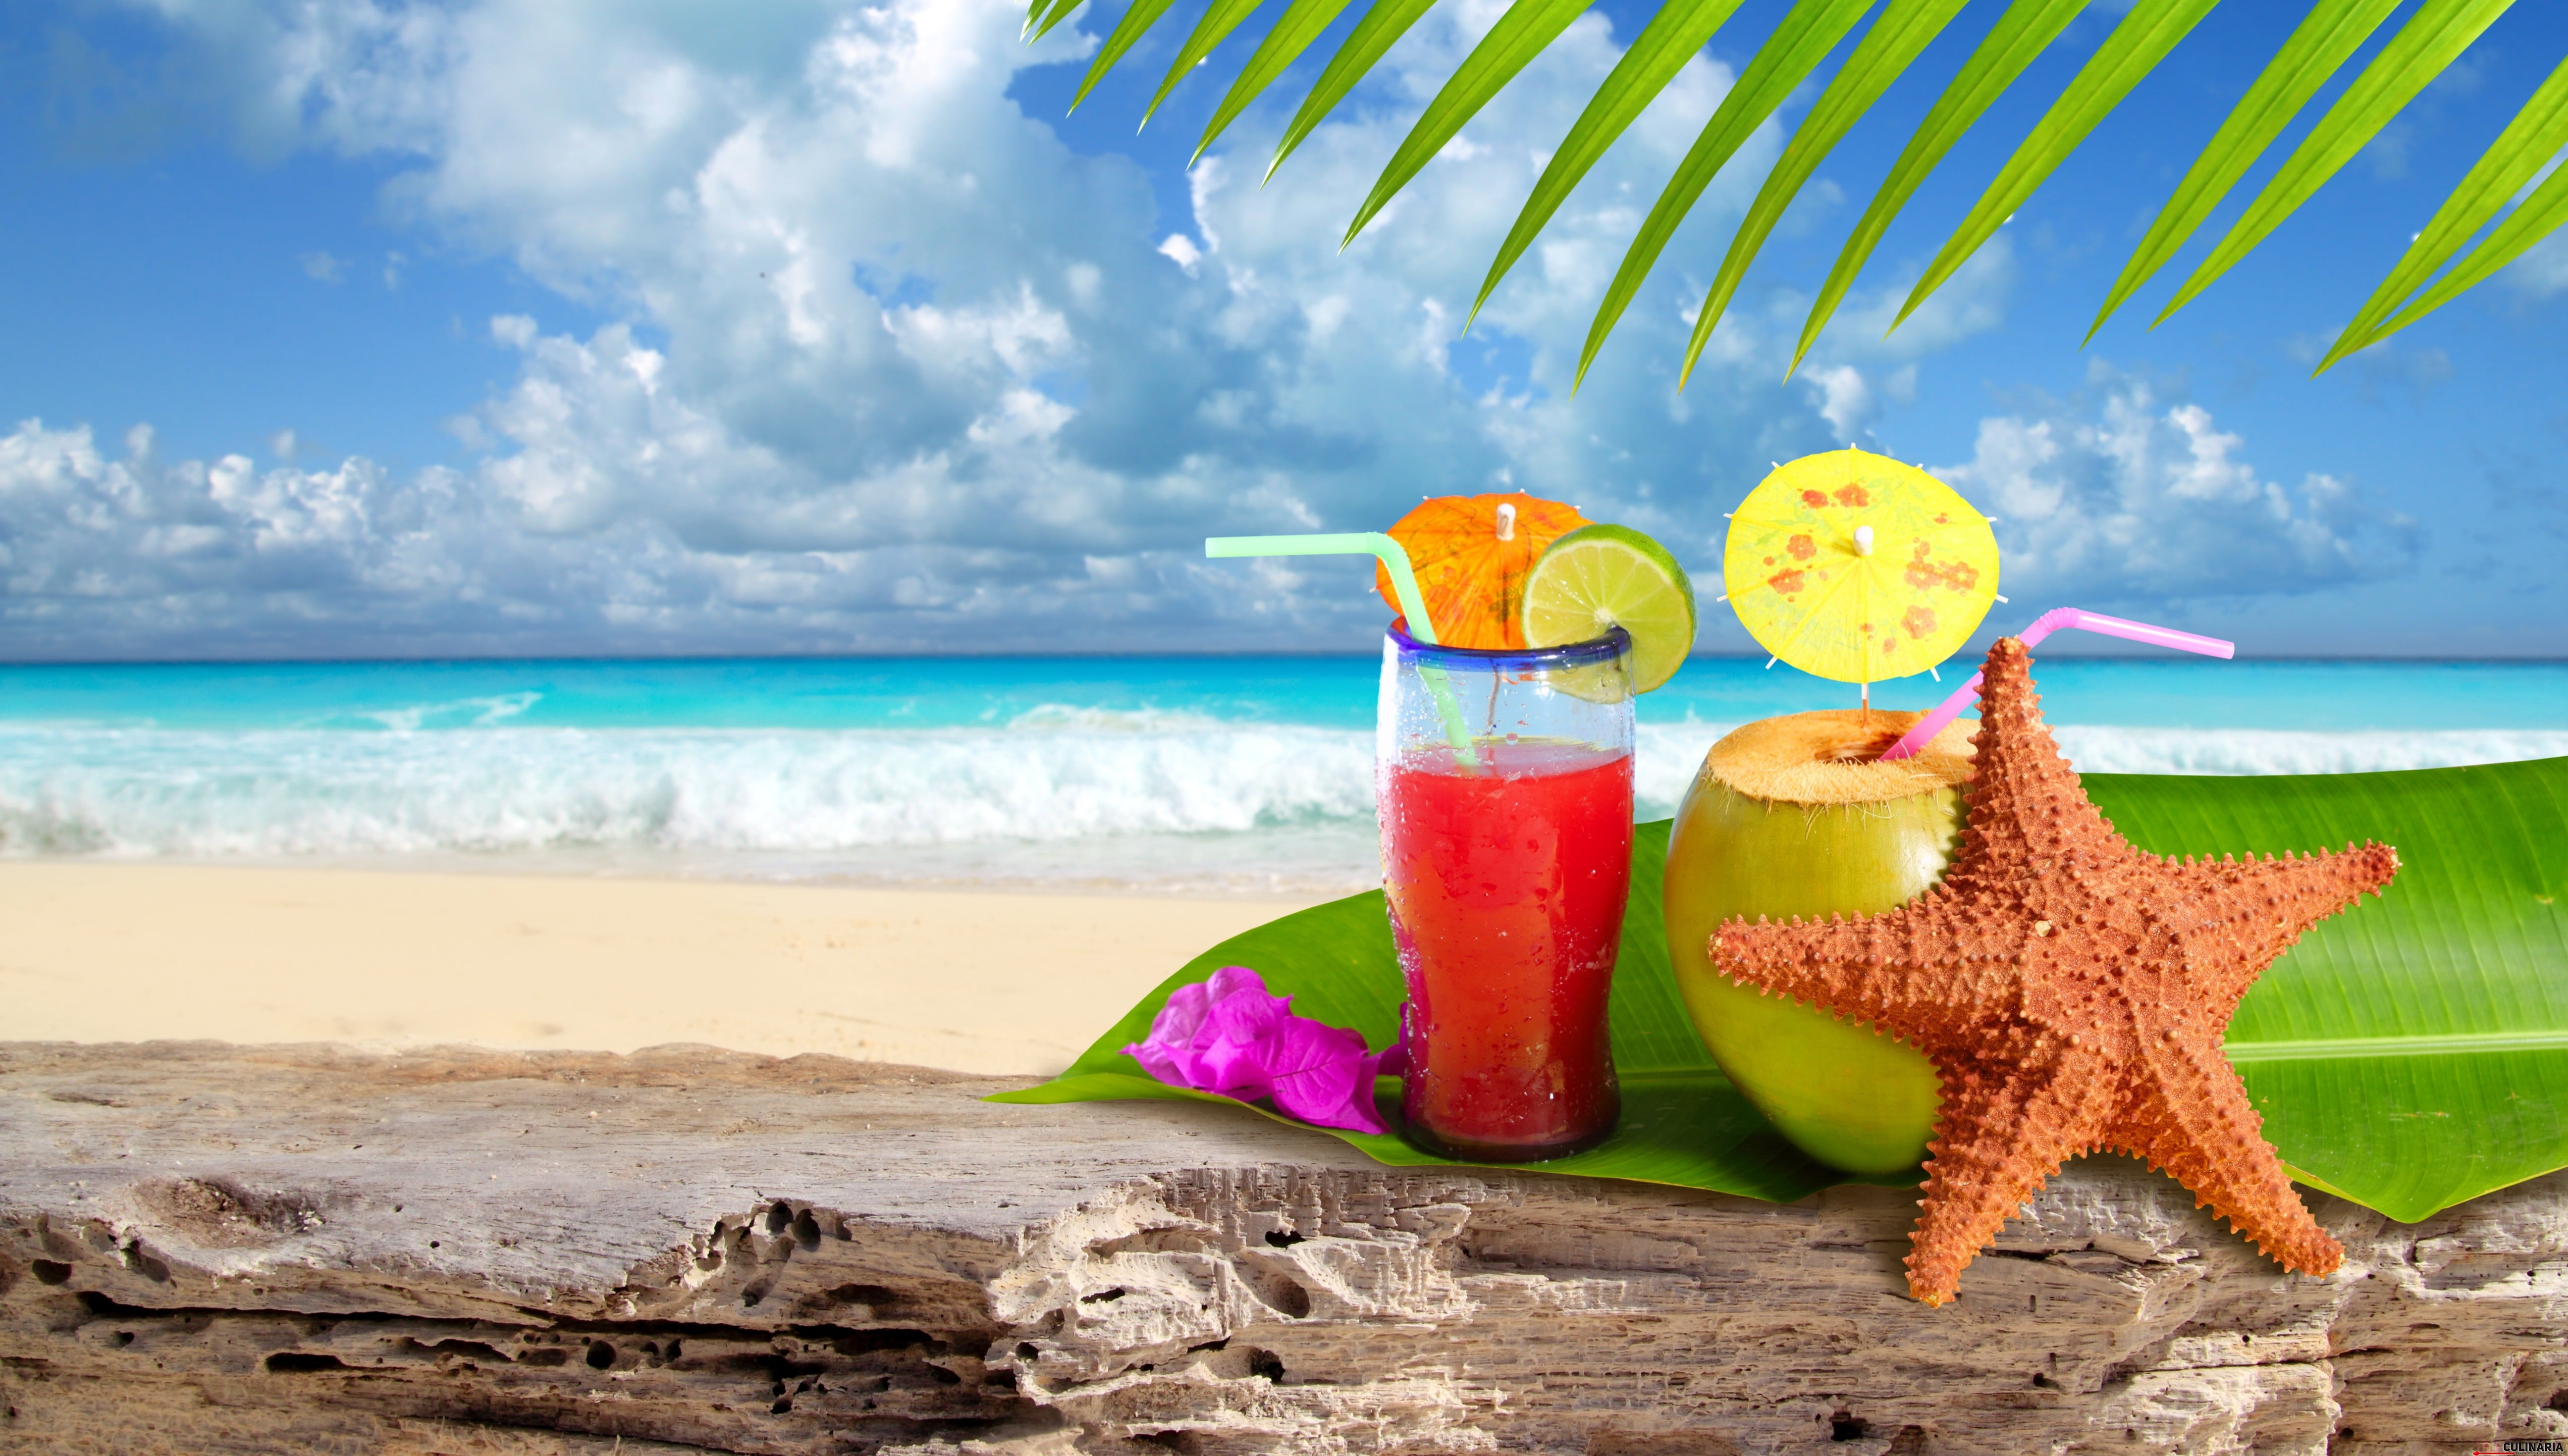 Coconut cocktail starfish tropical Caribbean beach refreshment